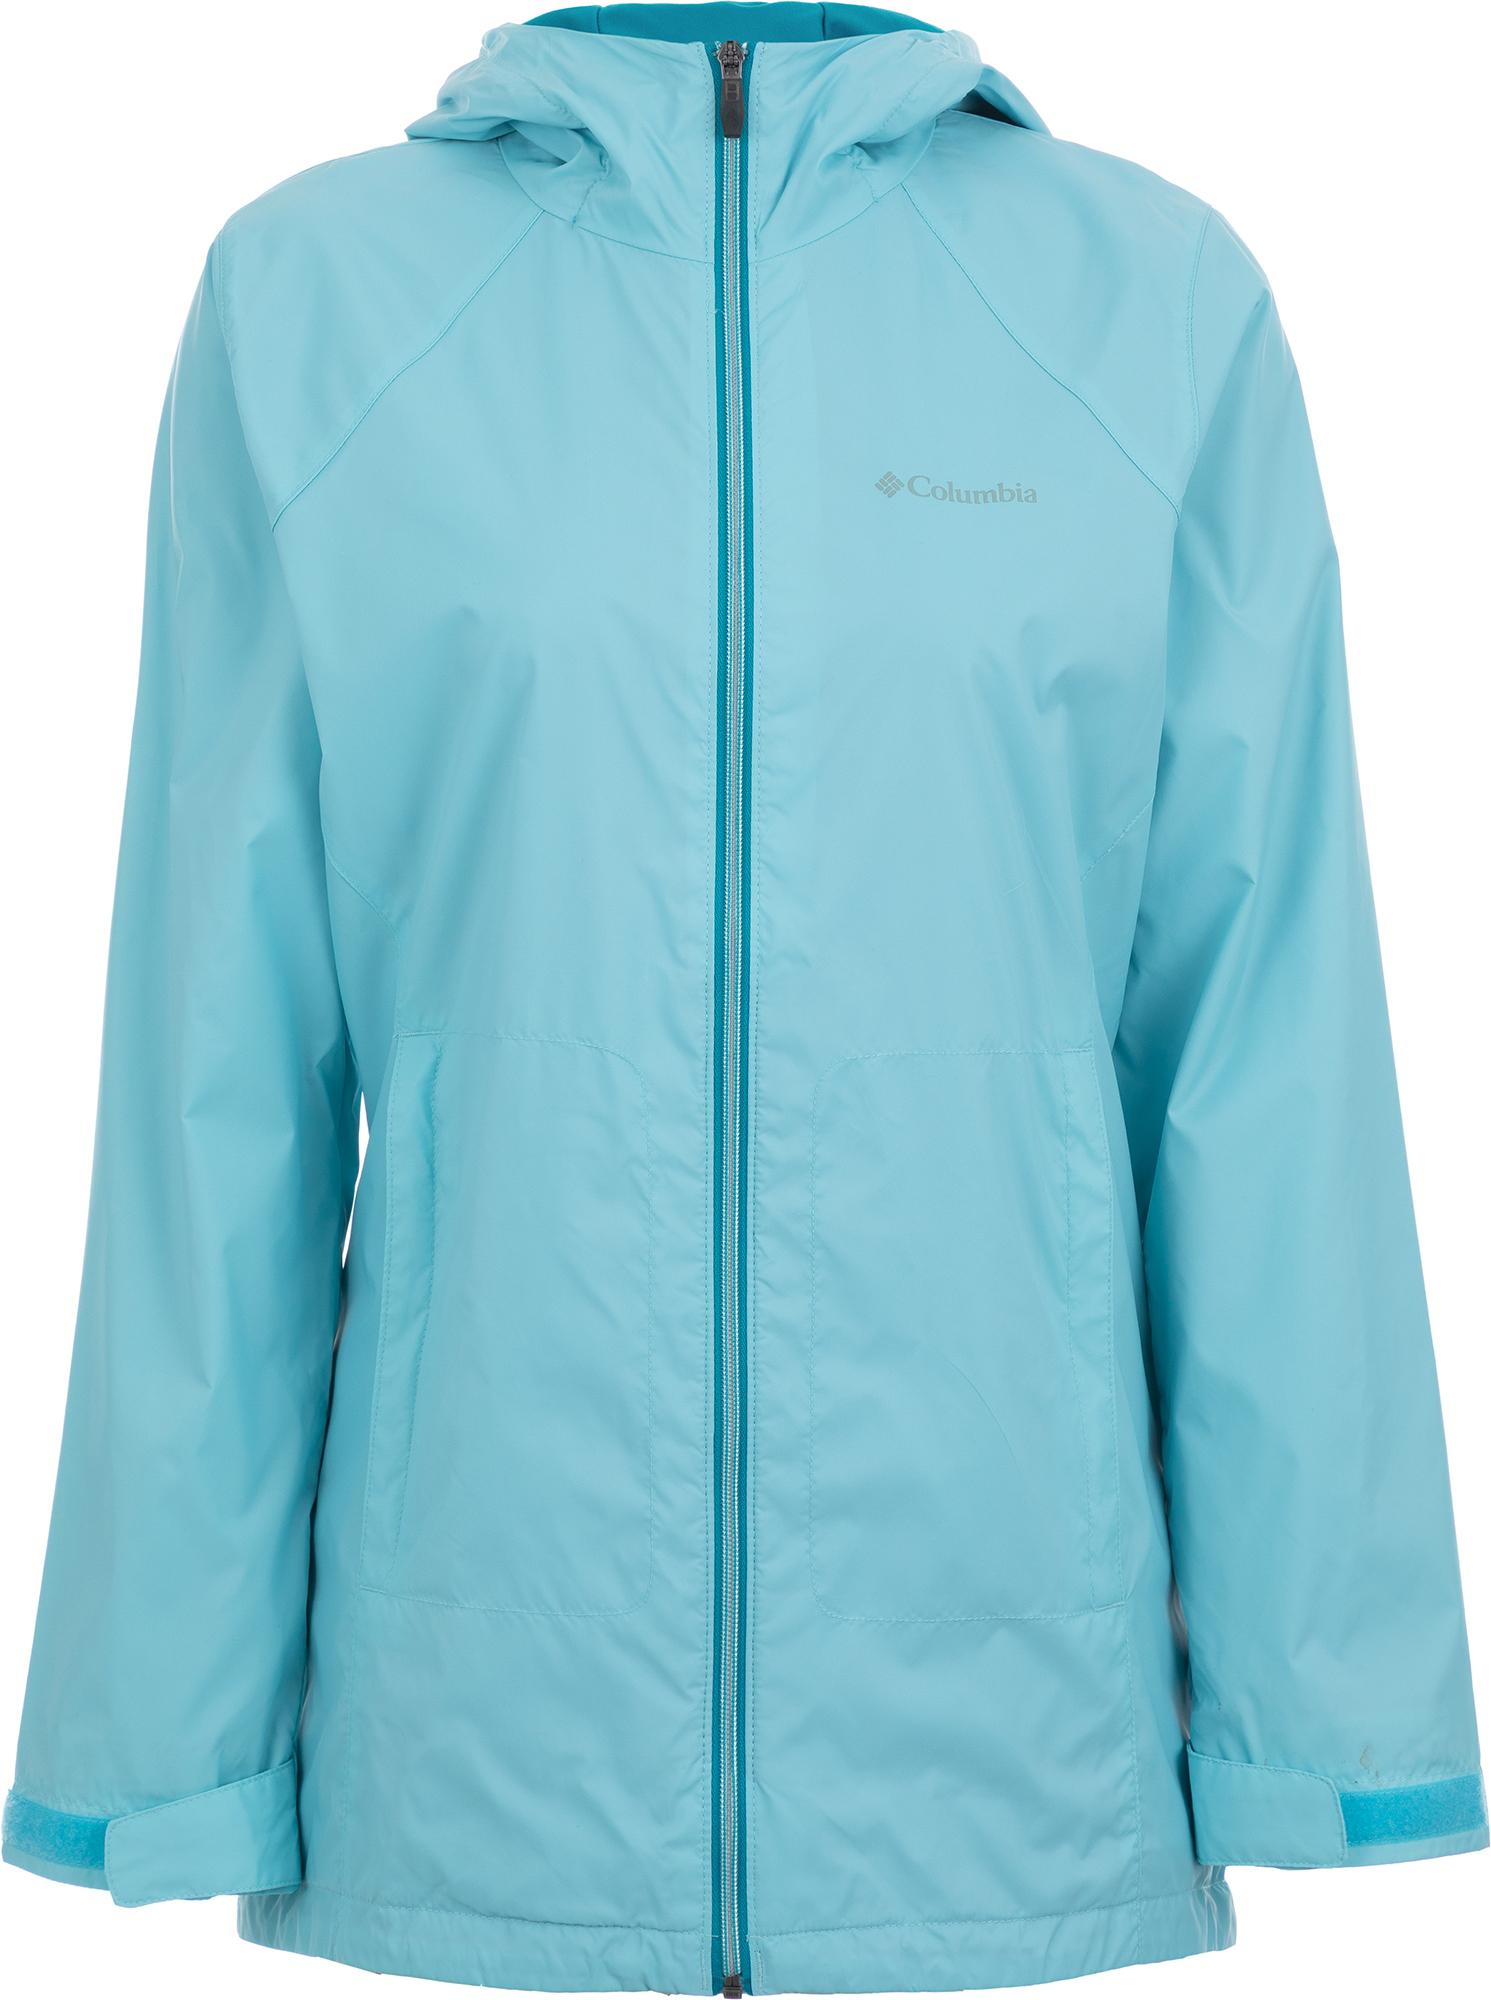 все цены на Columbia Куртка утепленная женская Columbia Switchback Lined, размер 52-54 онлайн